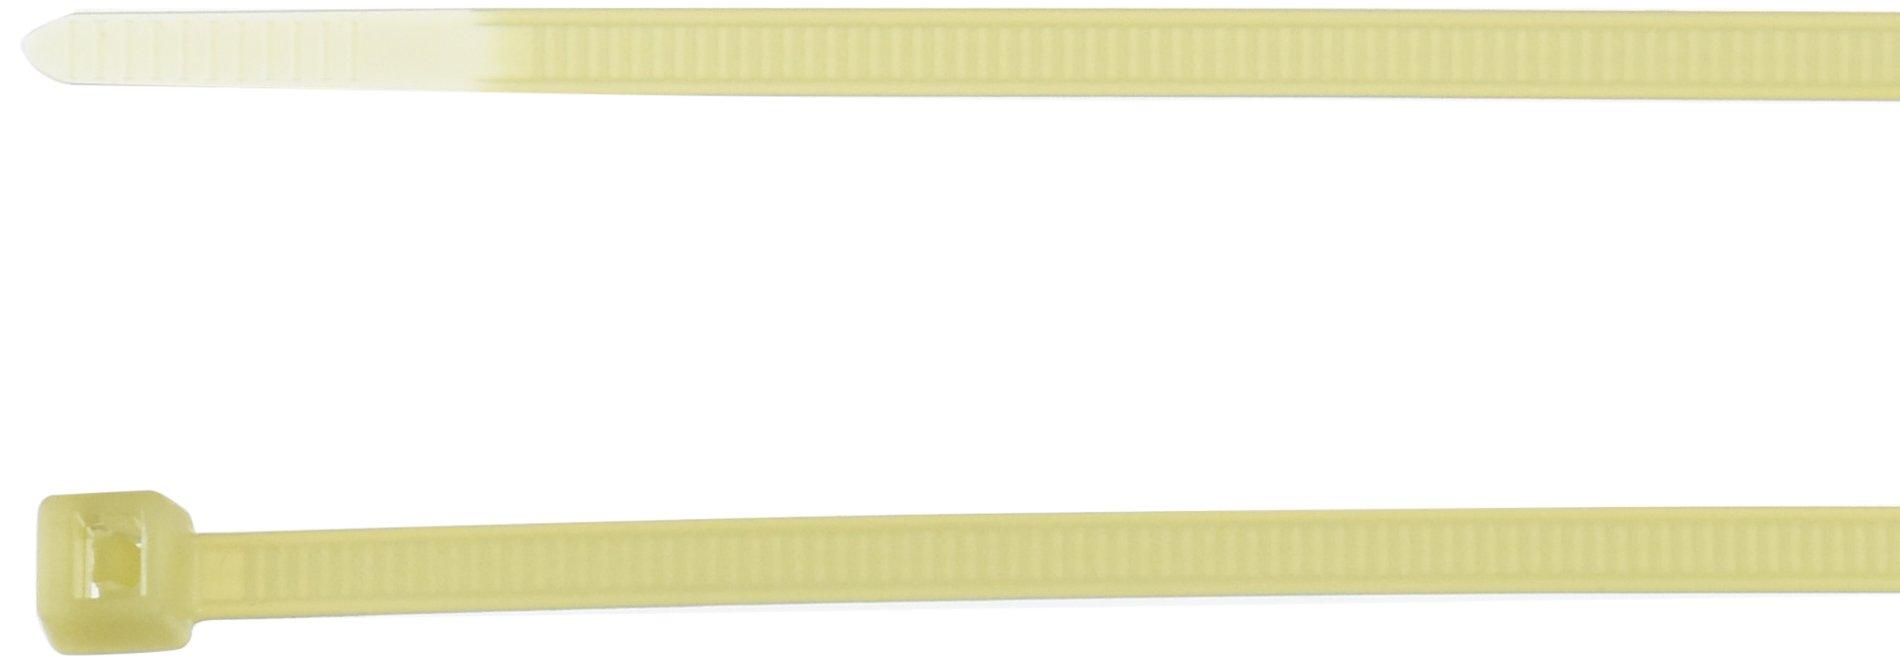 Hellermann Tyton 111-00815 High Temp Tie, 8'' Long, 50lb Tensile Strength, PA46, Natural (Pack of 100)